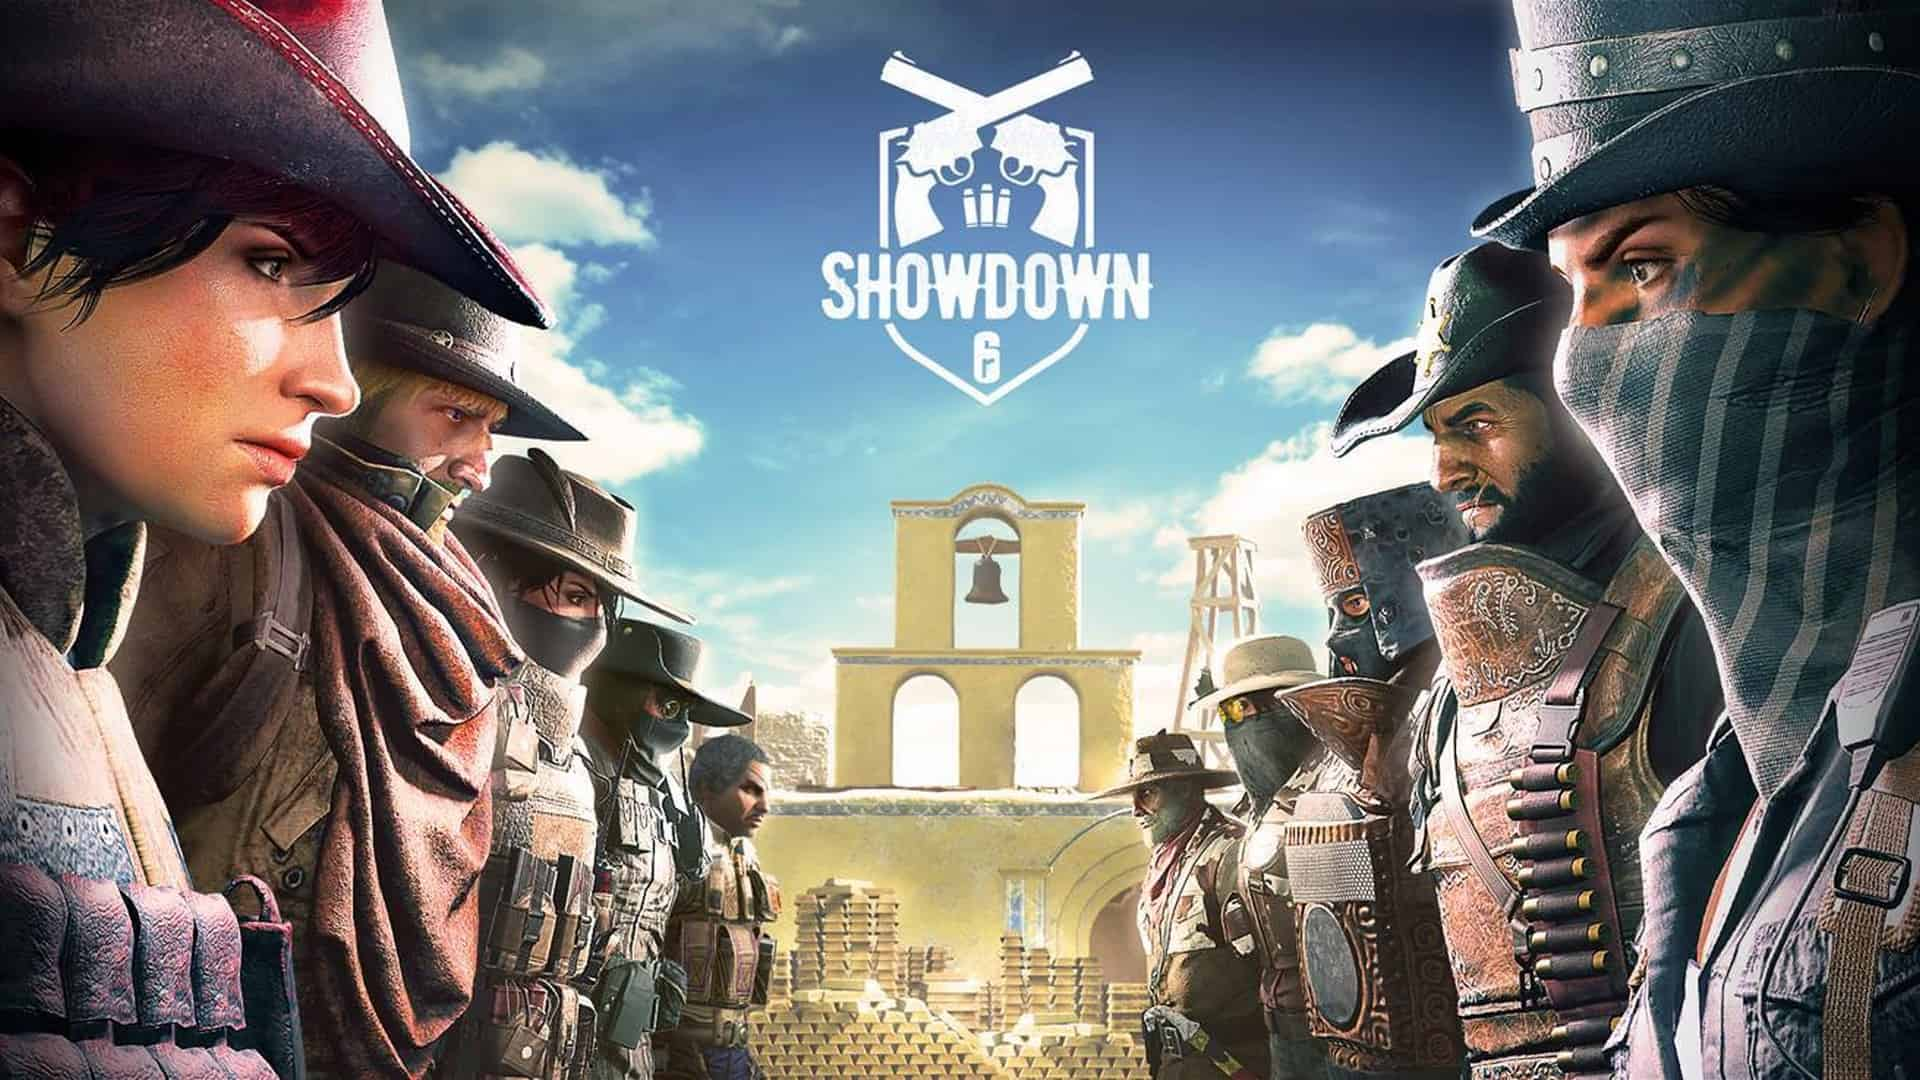 Ubisoft Announces Tom Clancy's Rainbow Six Siege Limited-Time Showdown Event